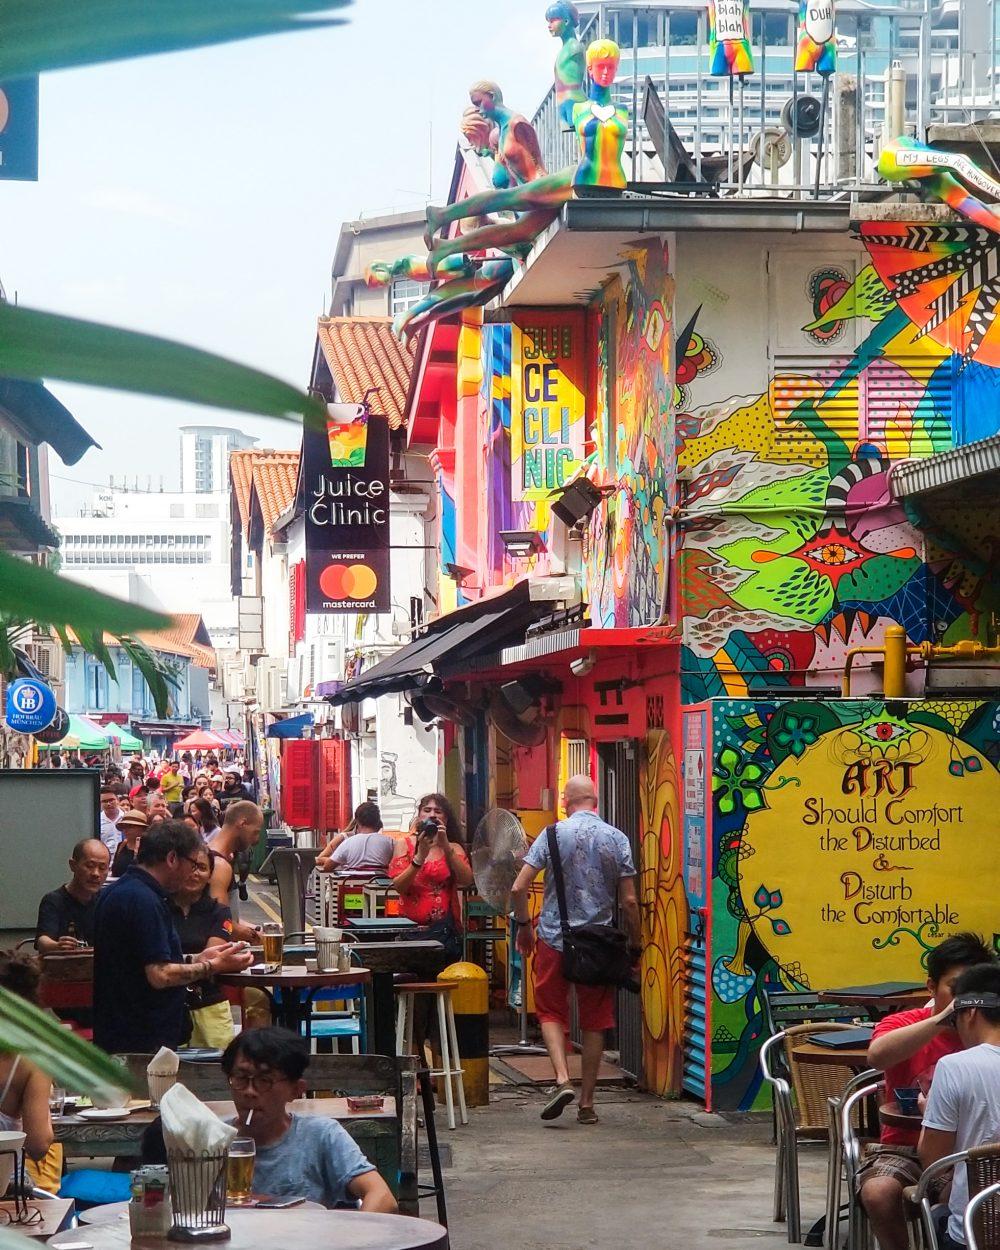 Colourful street art in Haji Lane